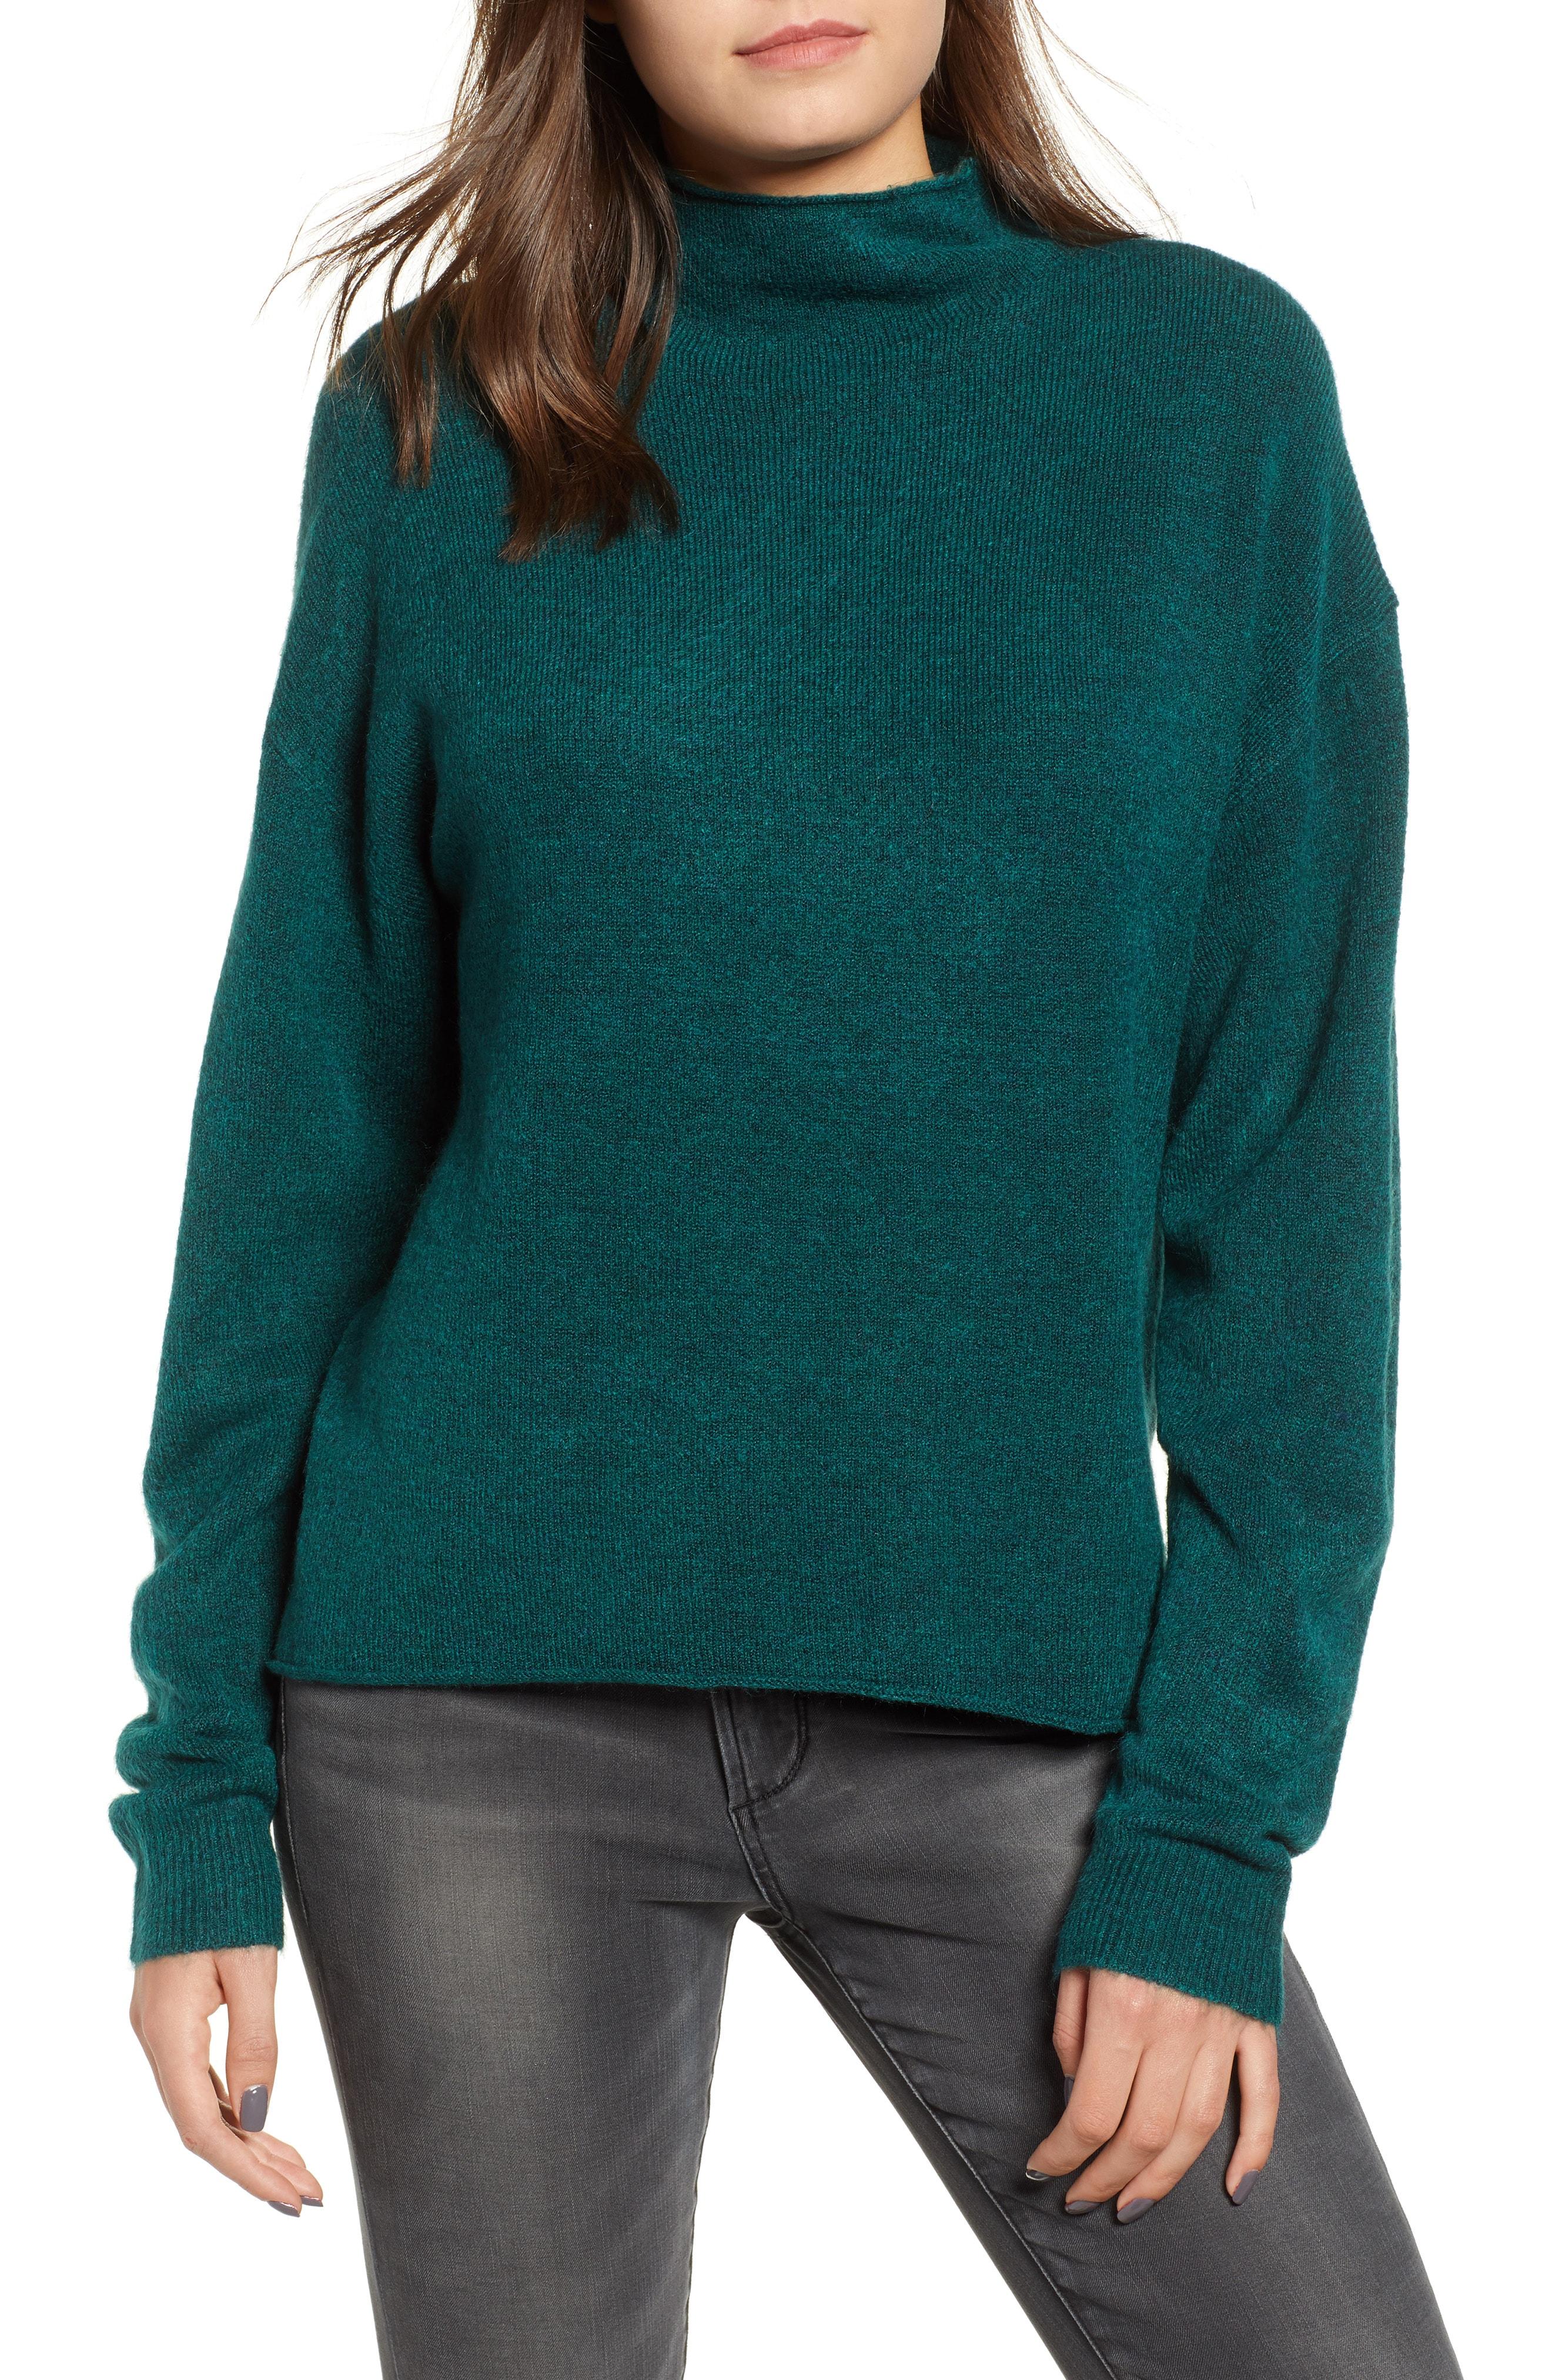 Leith Cozy Mock Neck Sweater (Regular & Plus Size)